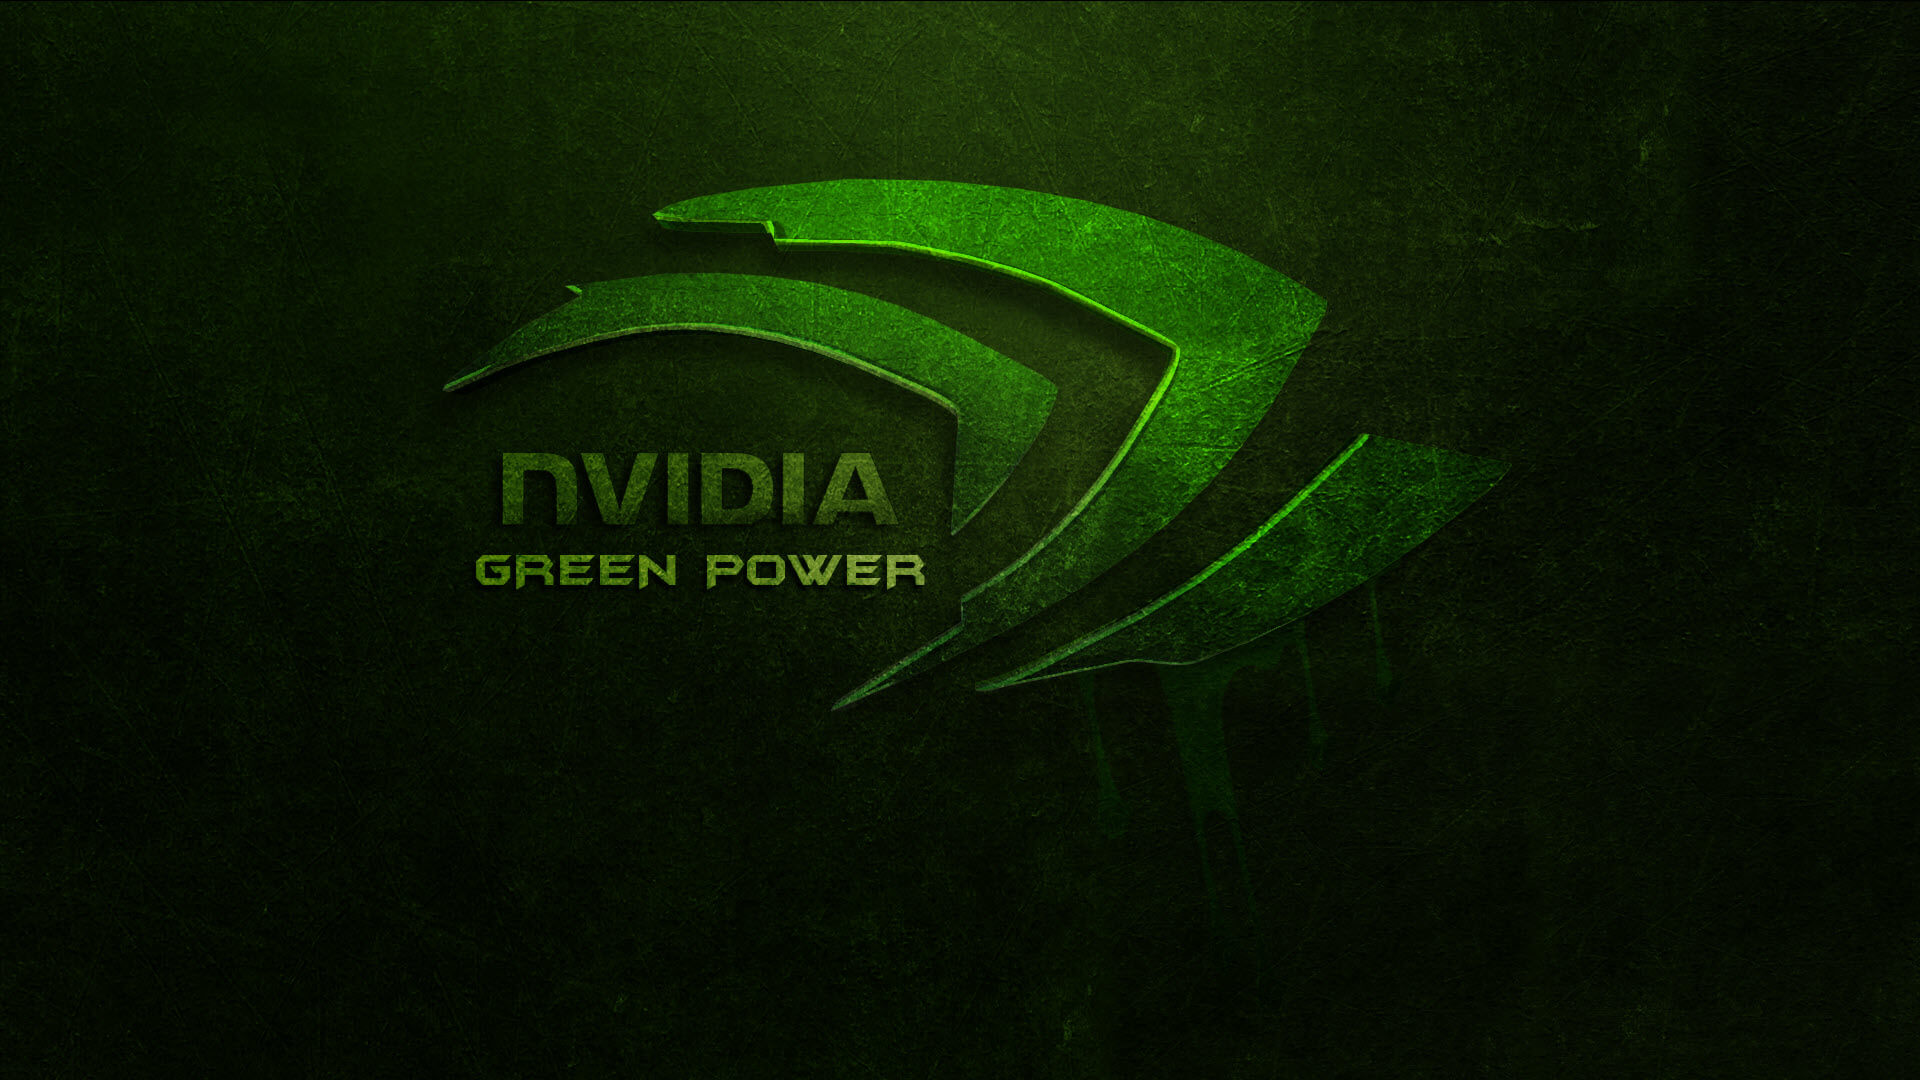 Обои На Рабочий Стол Nvidia